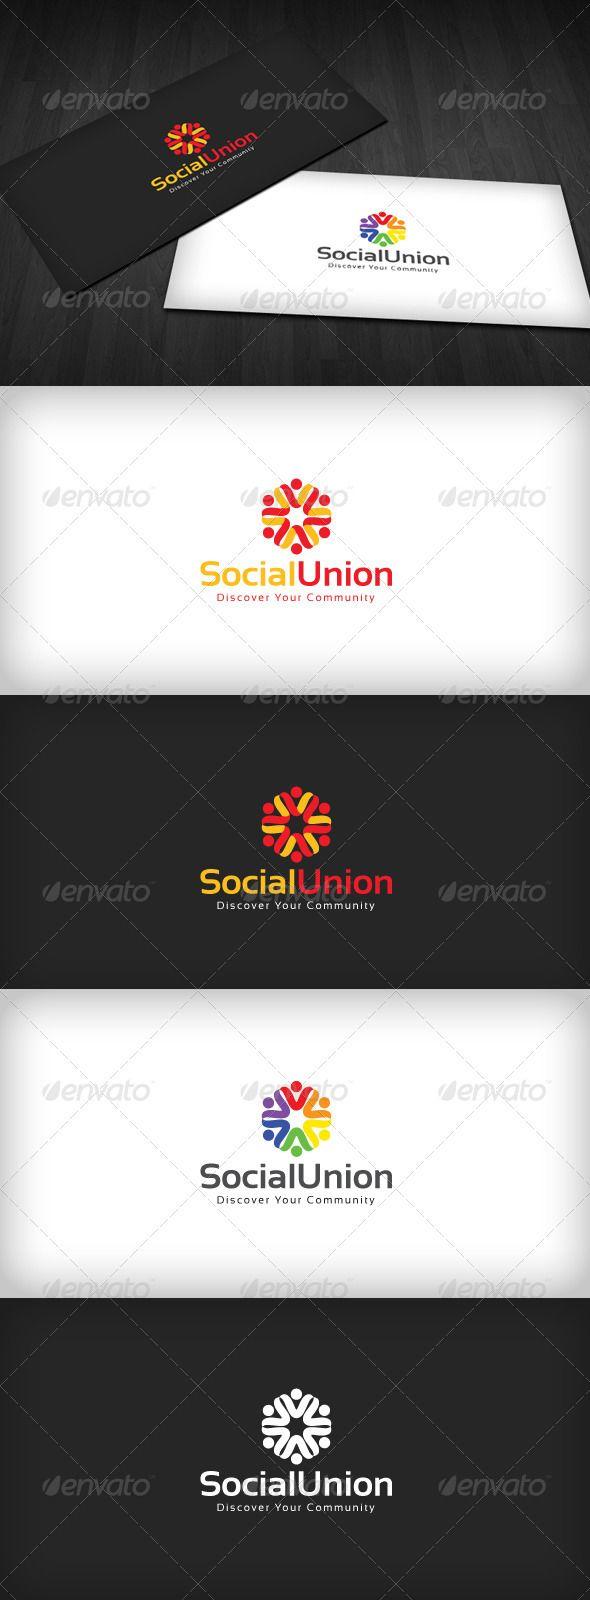 Social Union Logo Design Template Vector #logotype Download it here: http://graphicriver.net/item/social-union-logo/2123631?s_rank=744?ref=nexion